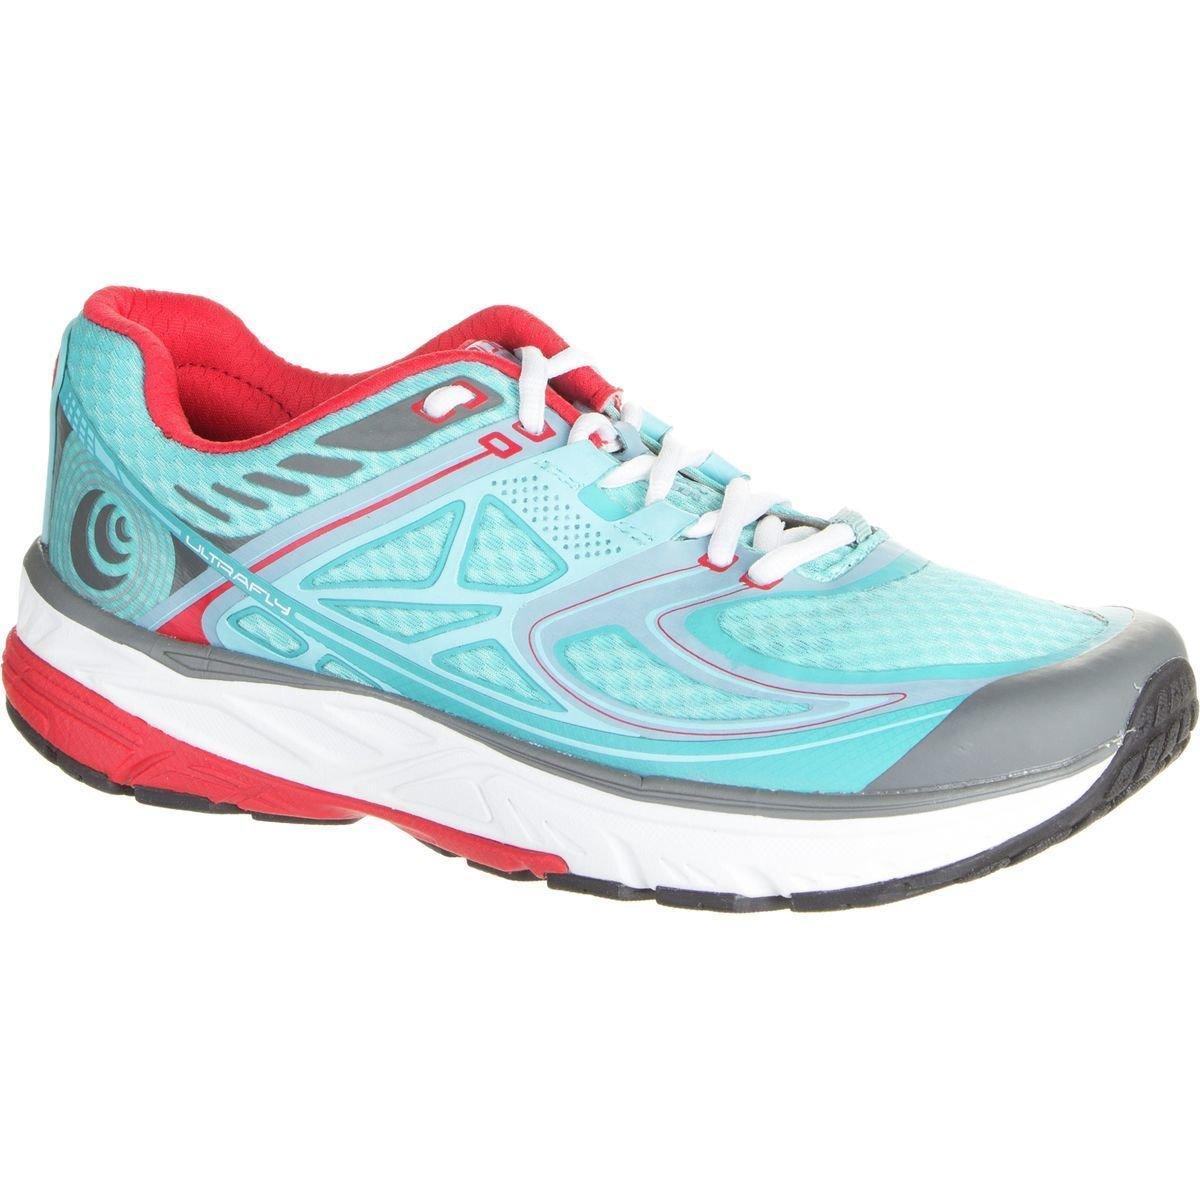 Topo Athletic Ultrafly Running Shoe - Women's B01FG8MQMK 8 B(M) US|Ice/Red